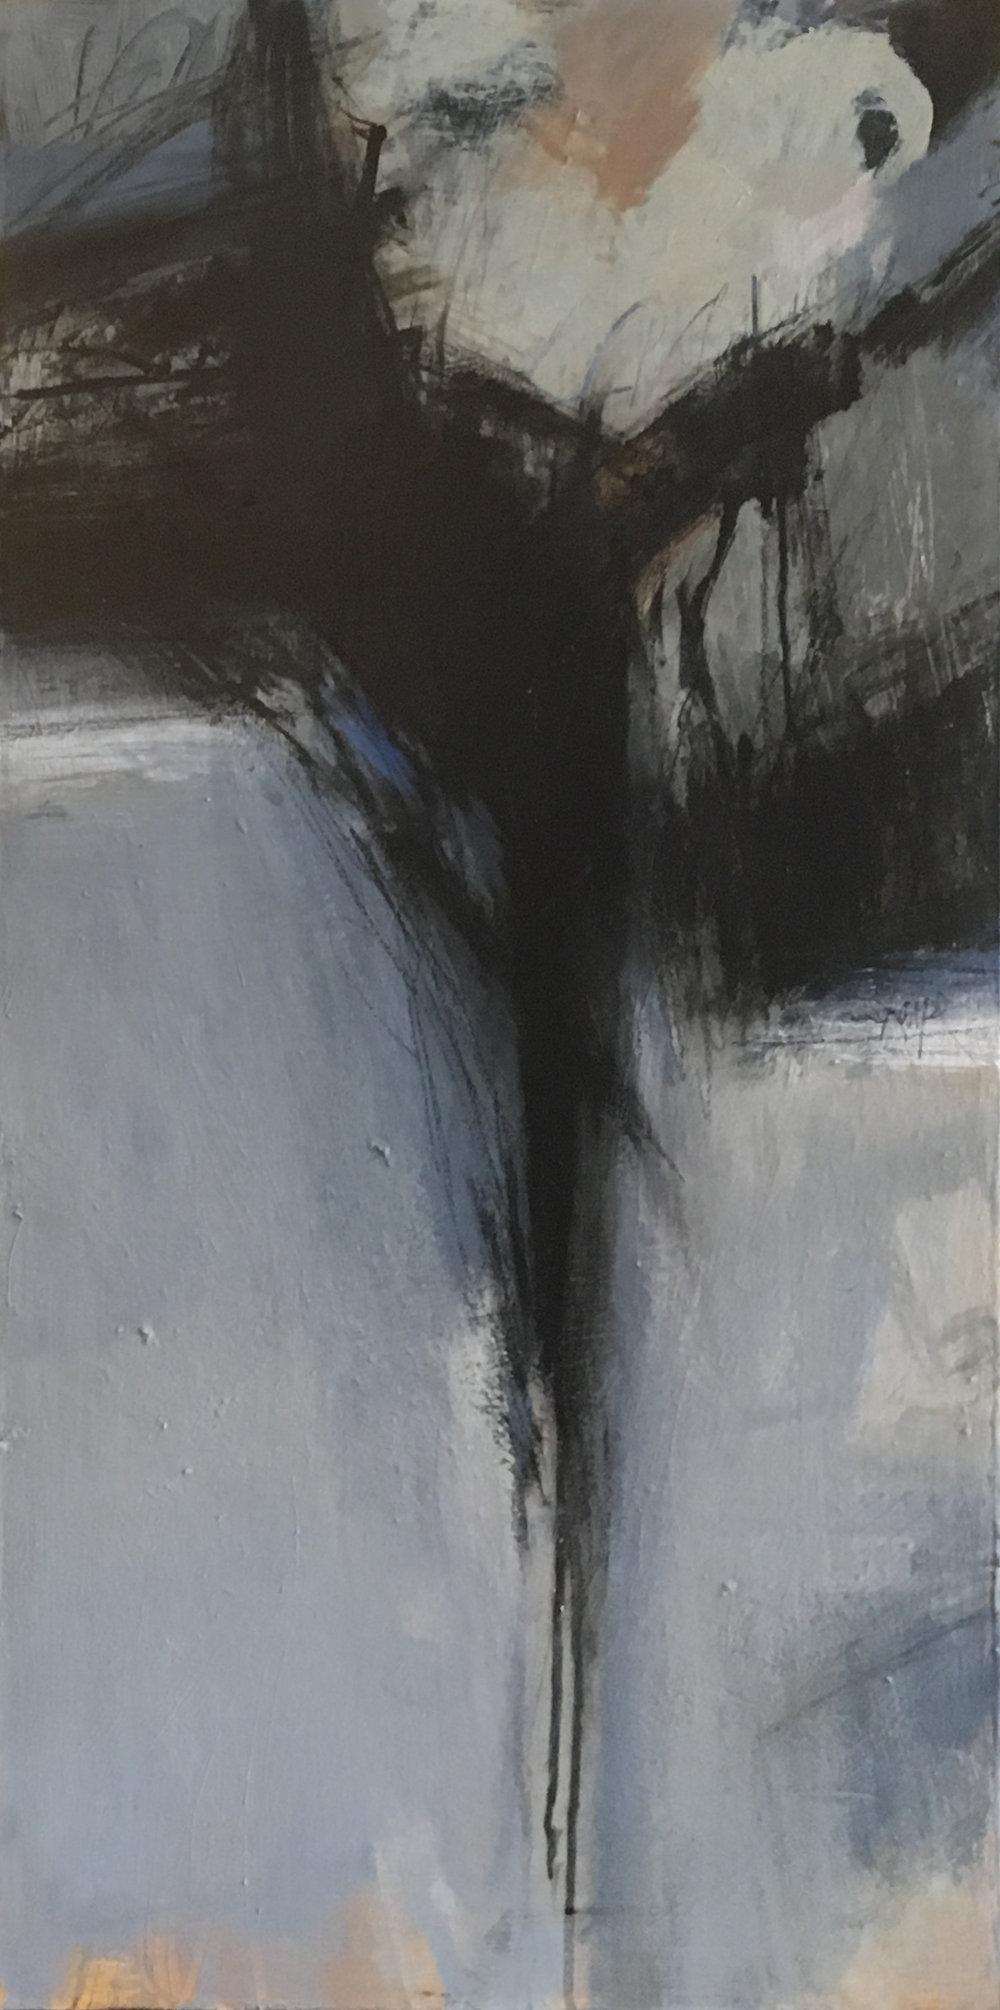 Black Ice by David Sharpe